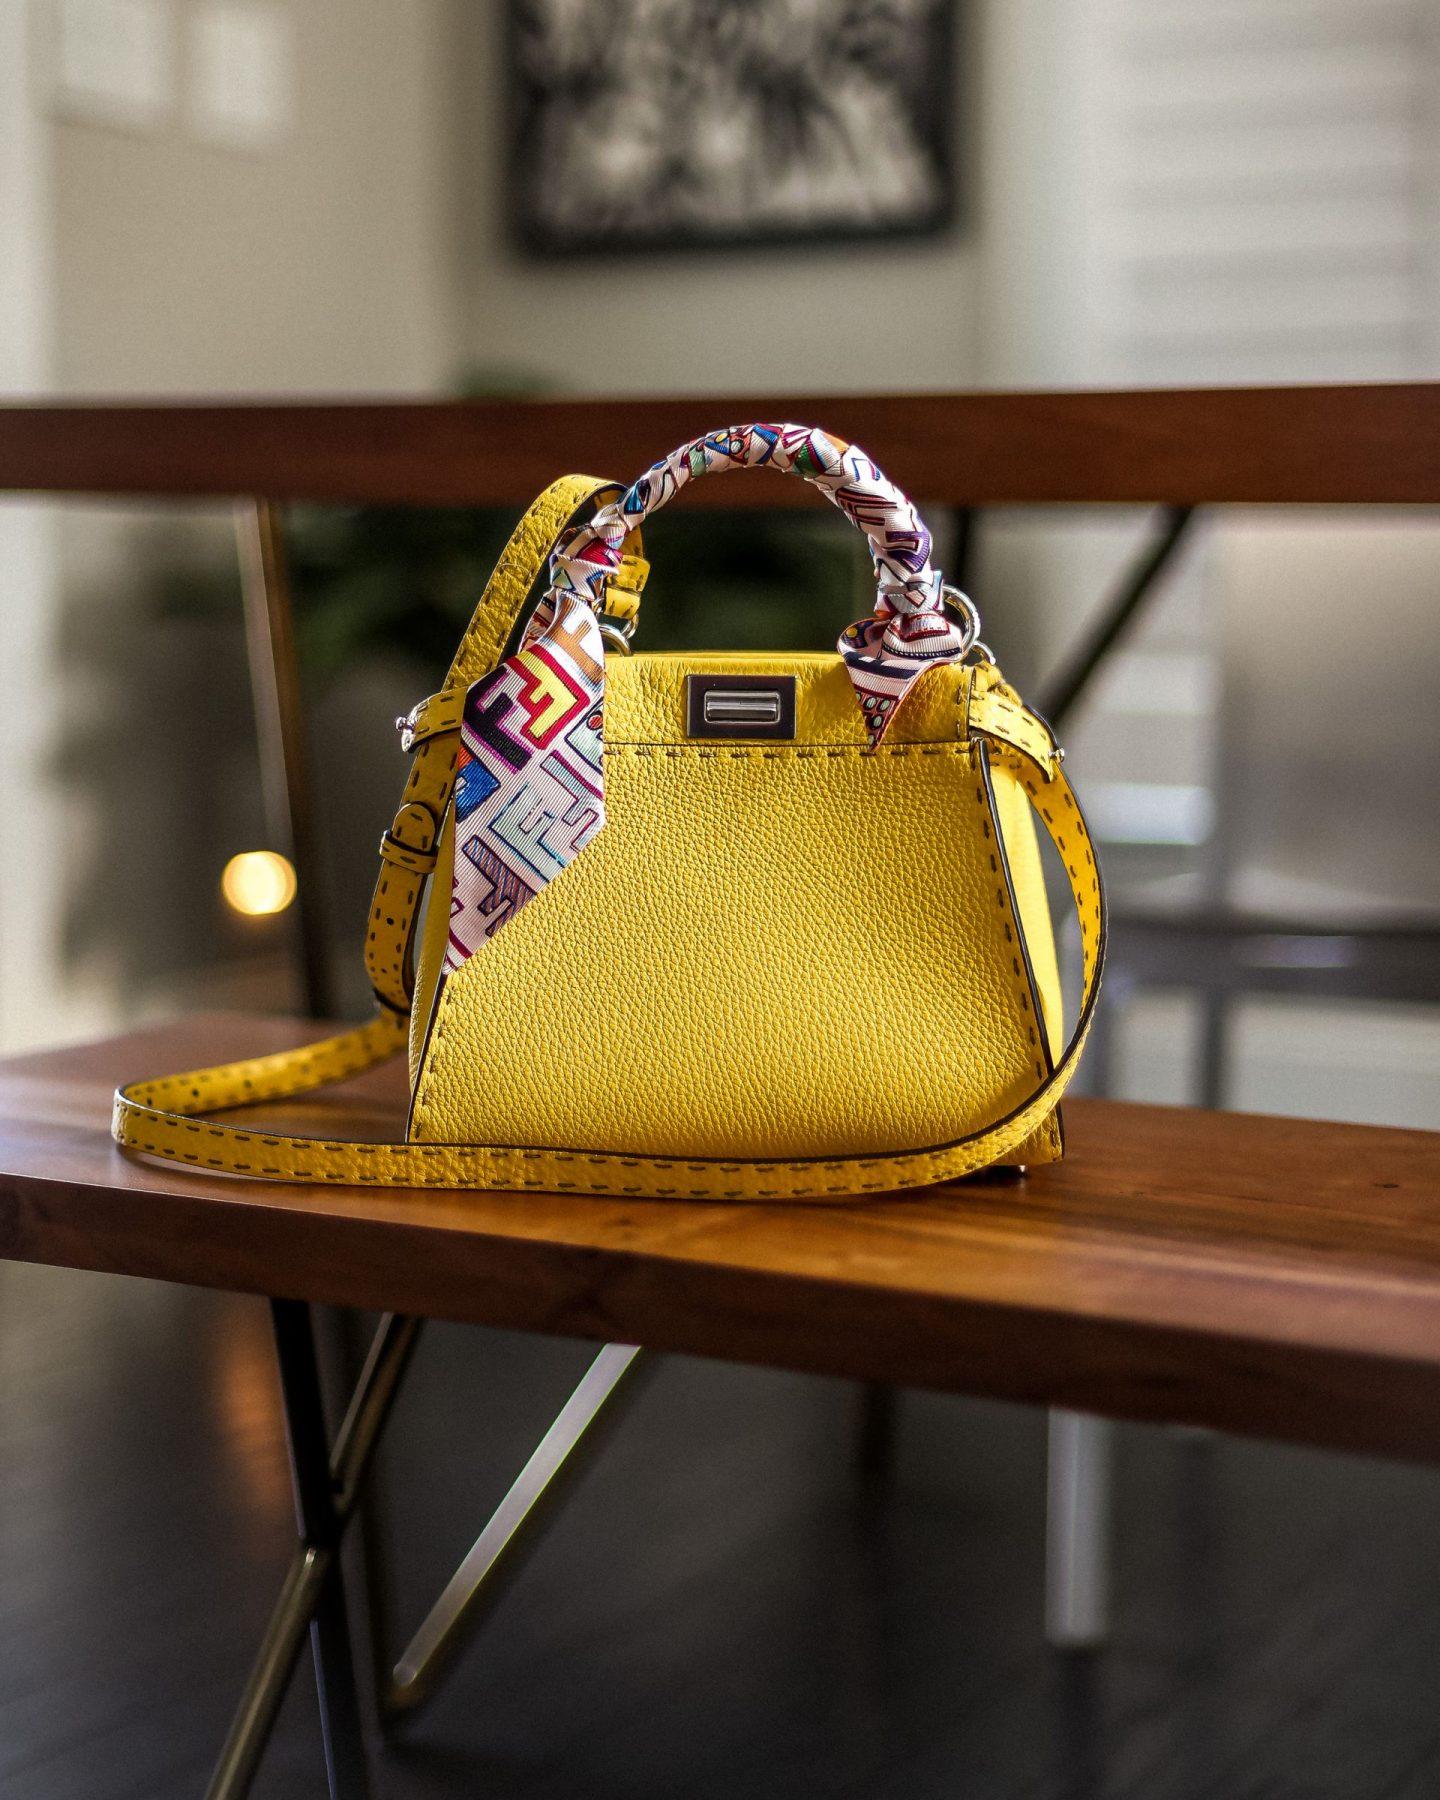 yellow peekaboo bag, fendi bag